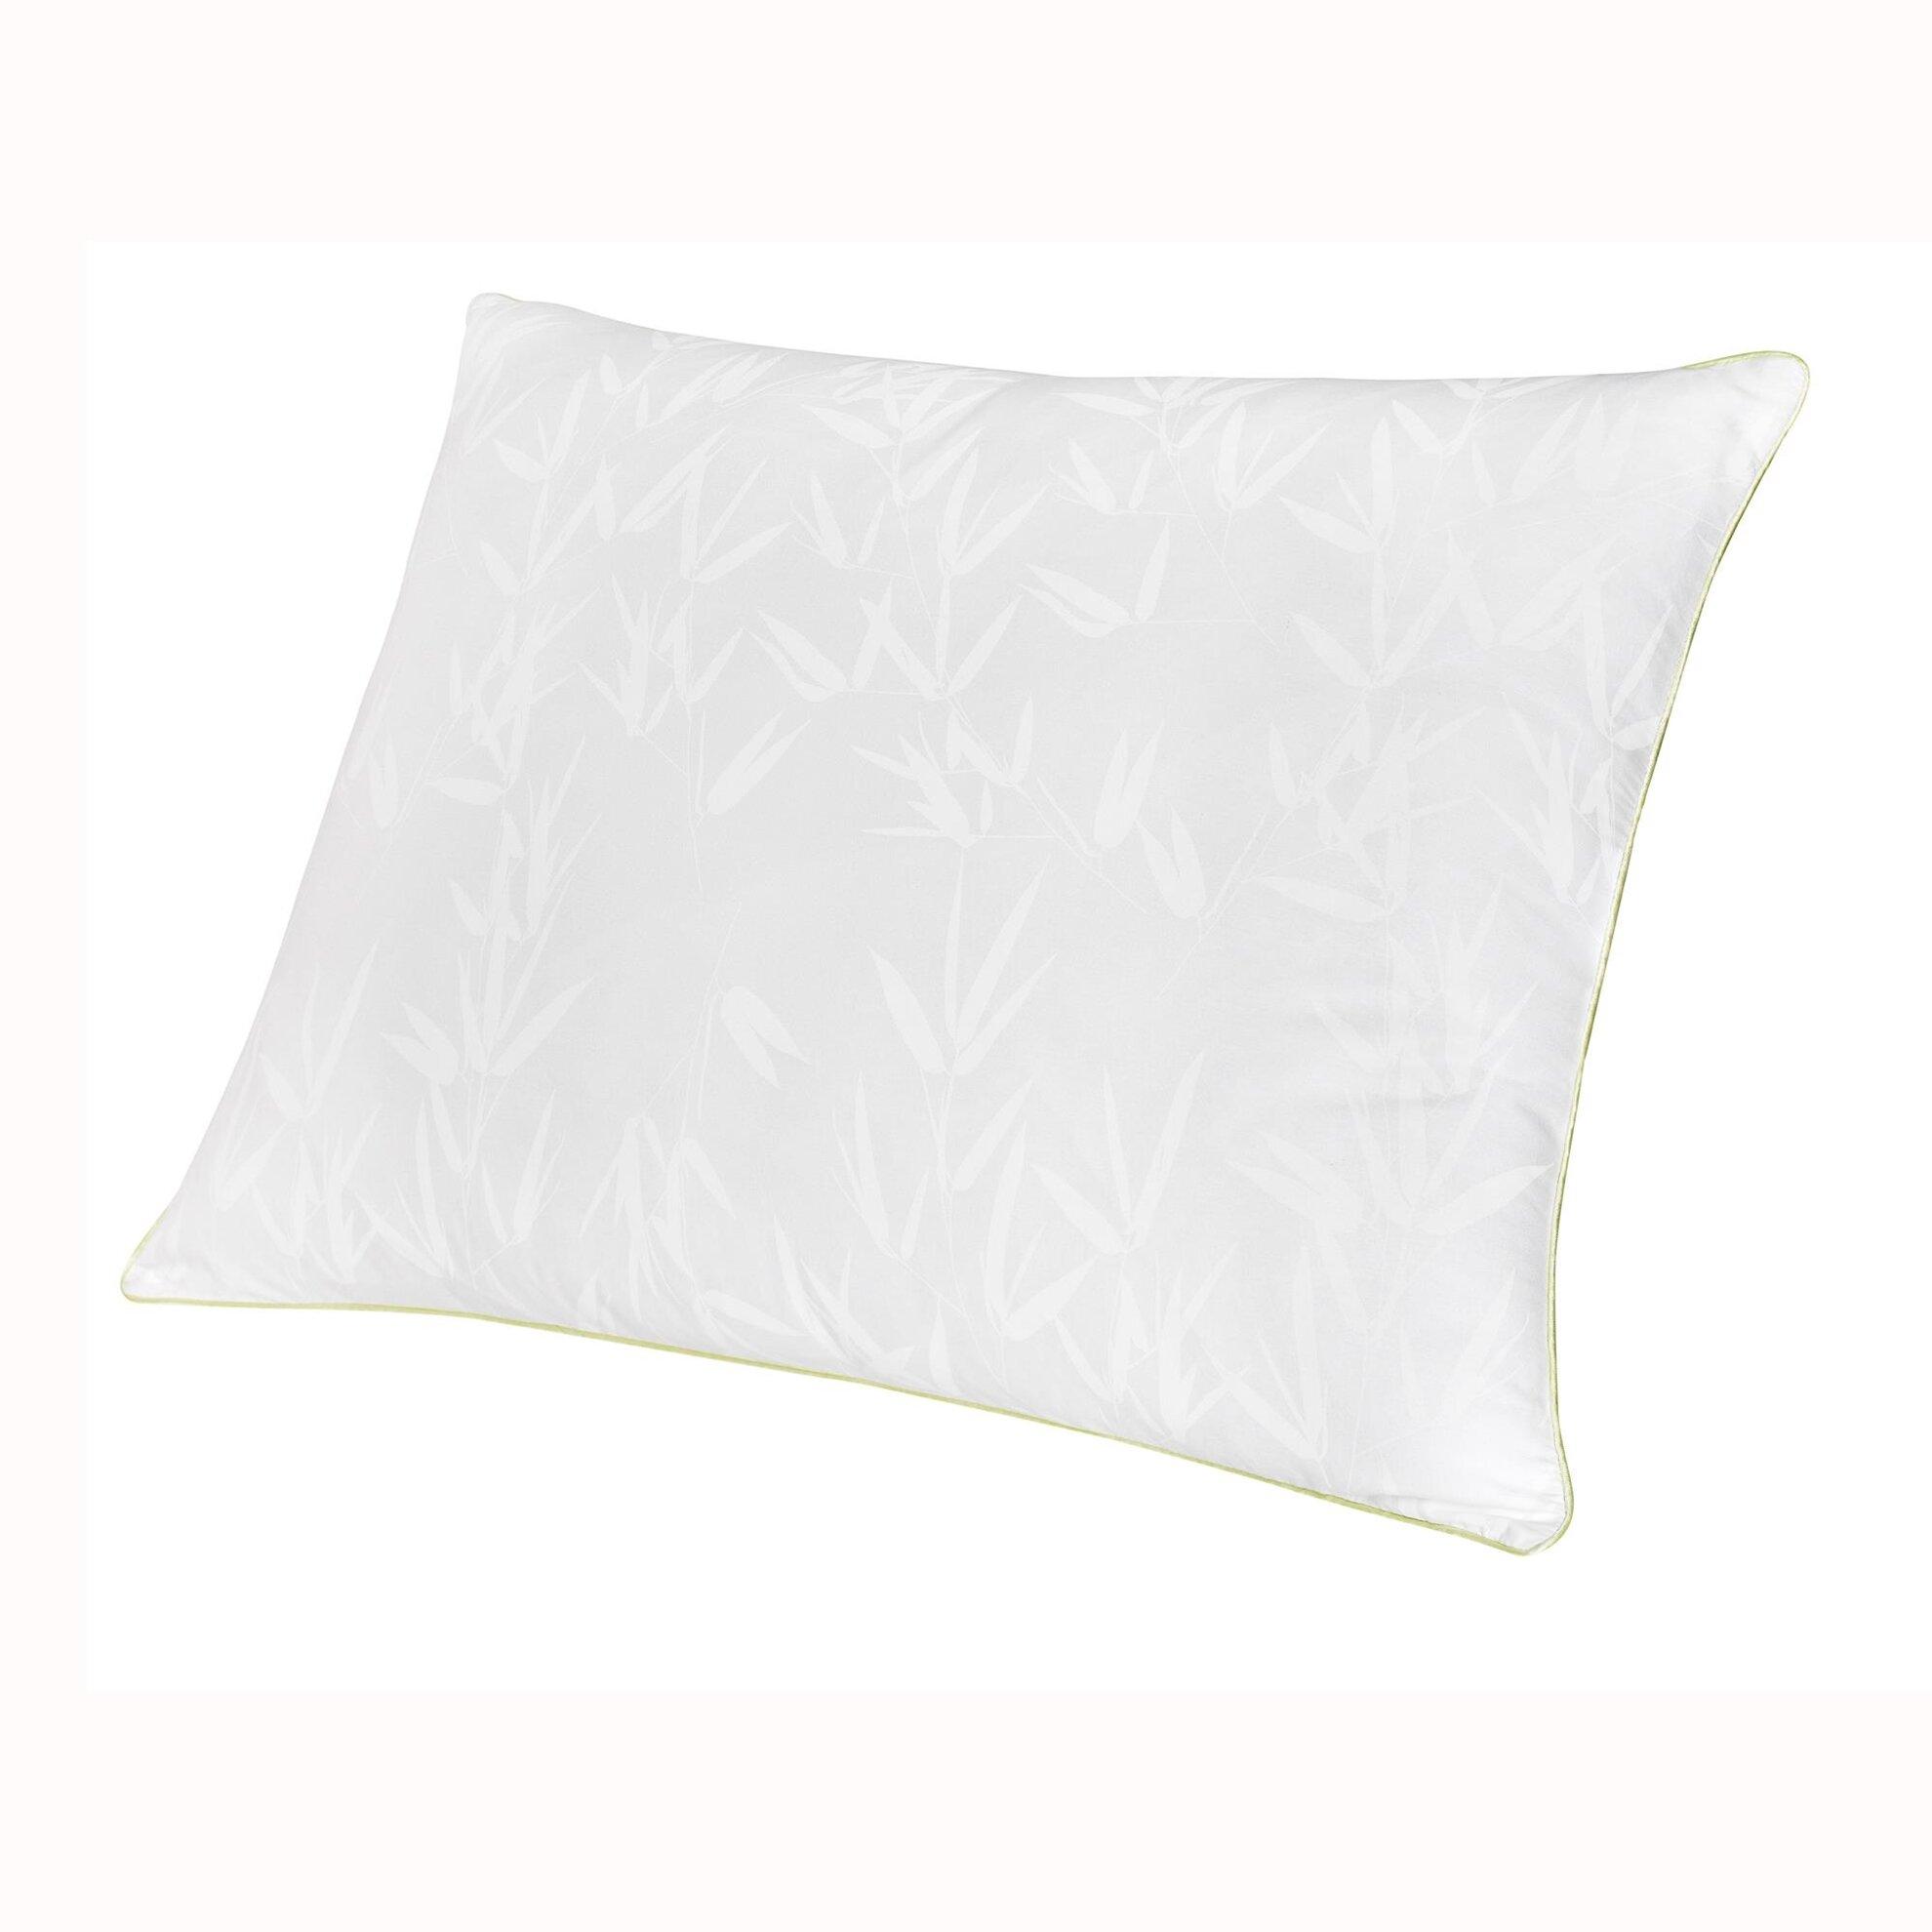 resm Taç Bambu - Cotton Yastık